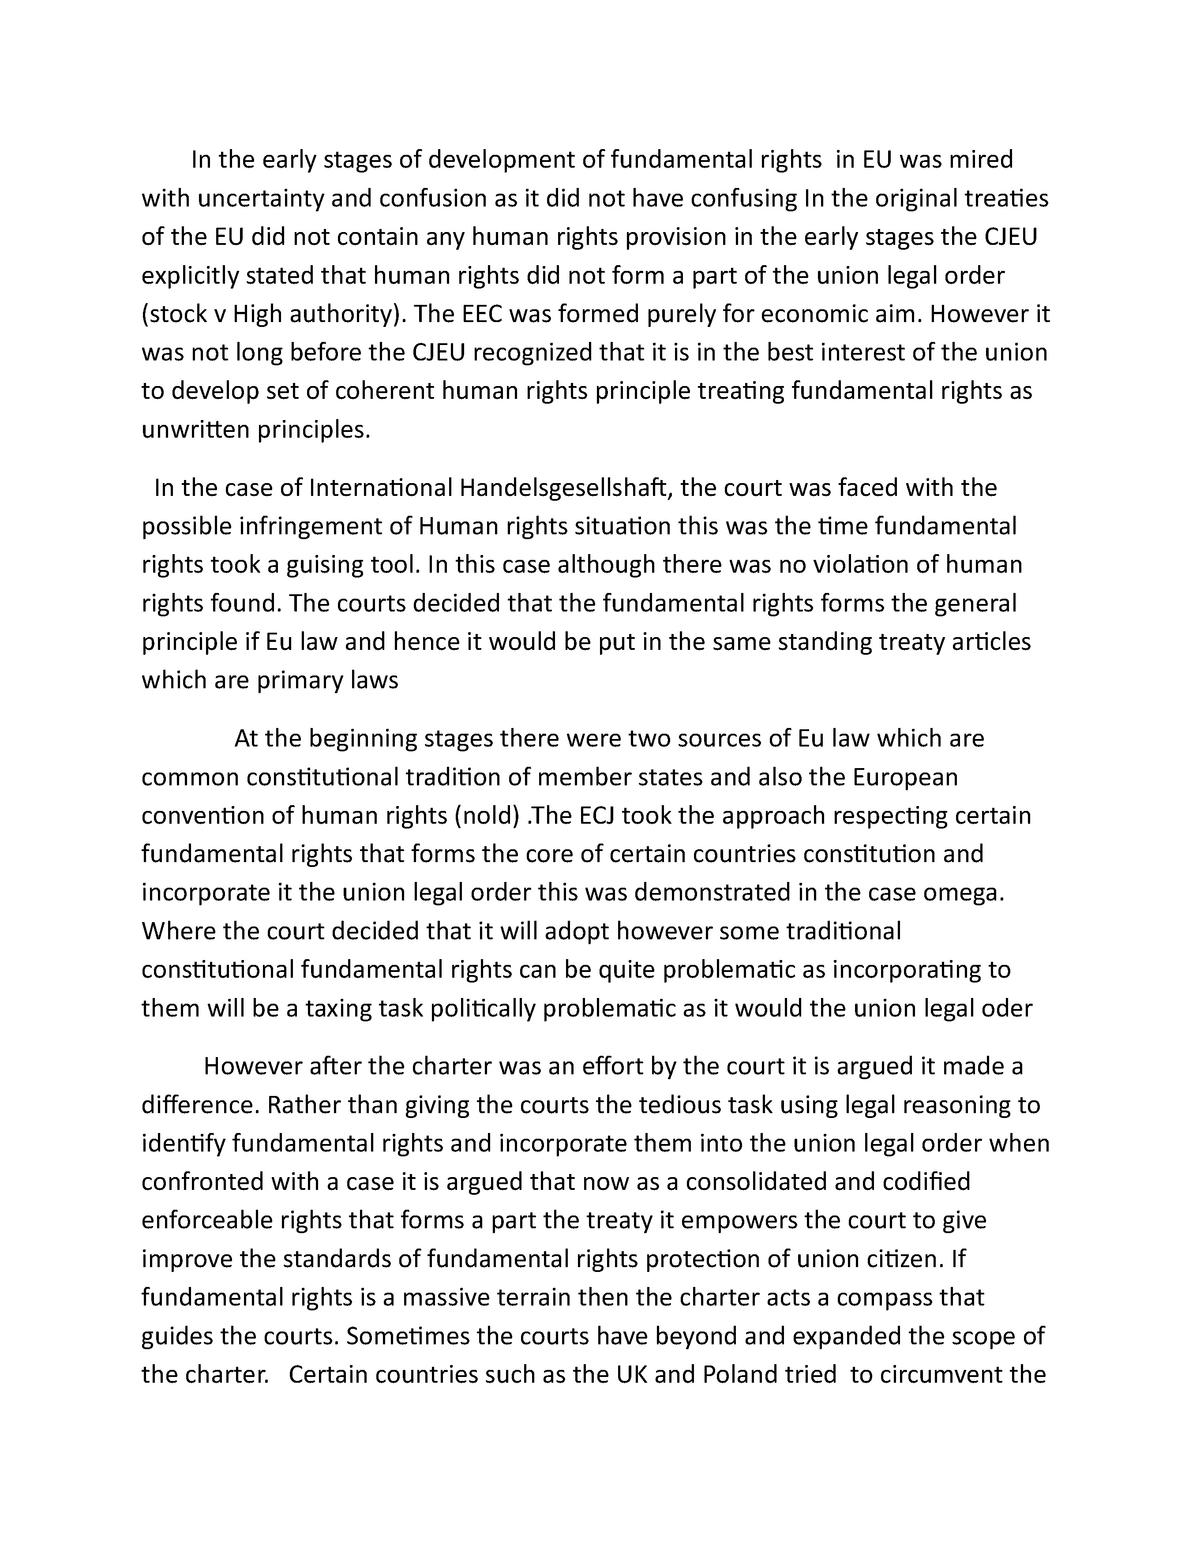 Pharmacy personal statement essay